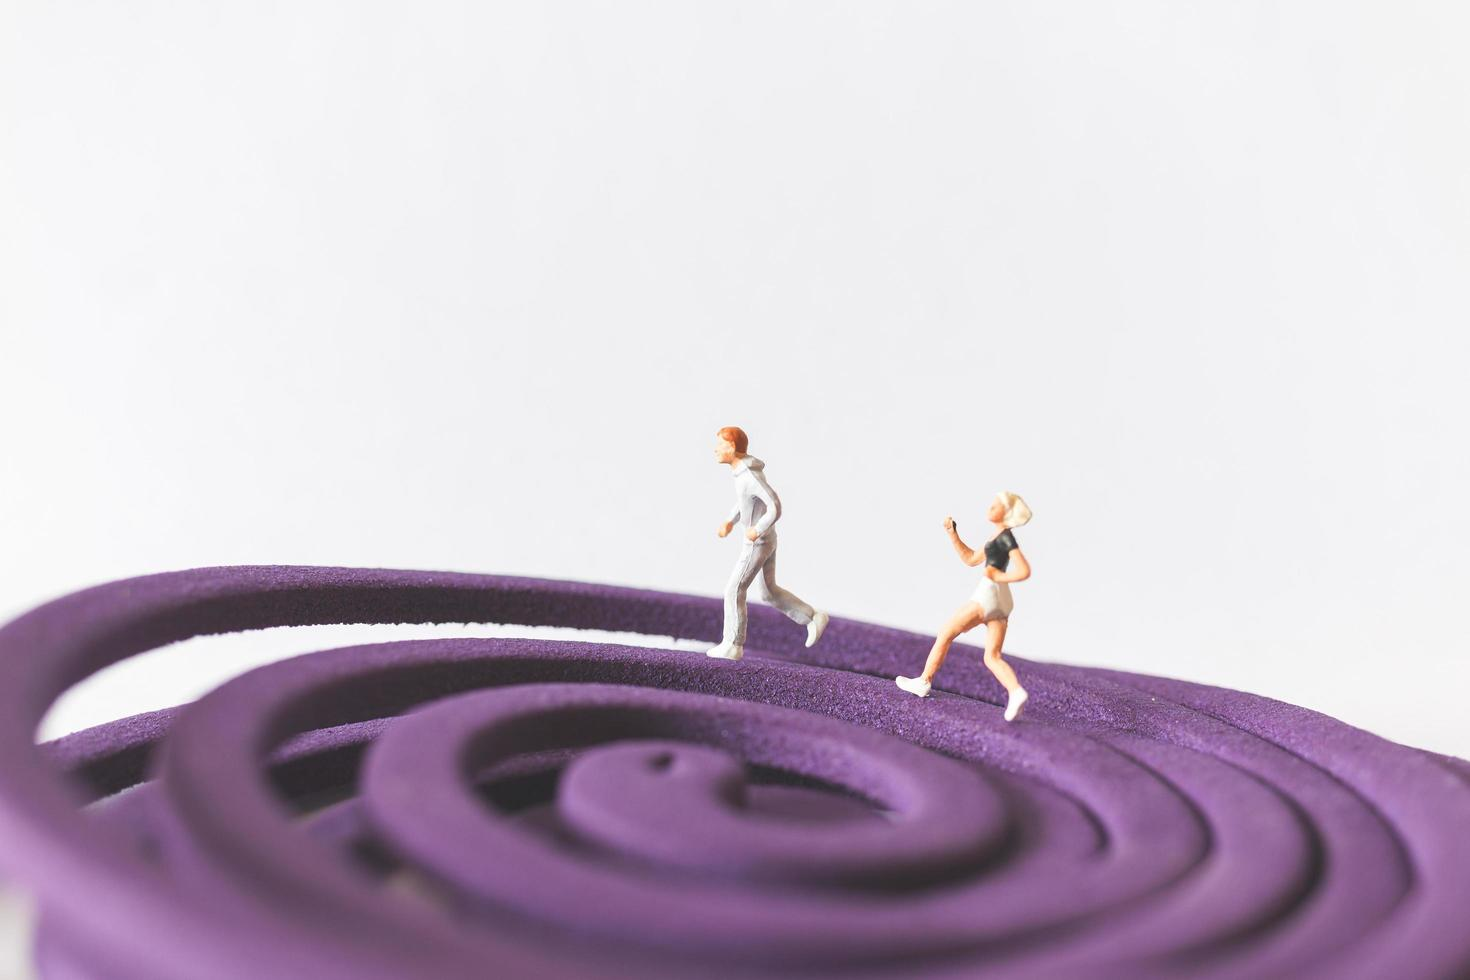 Pareja en miniatura corriendo sobre un campo circular púrpura foto